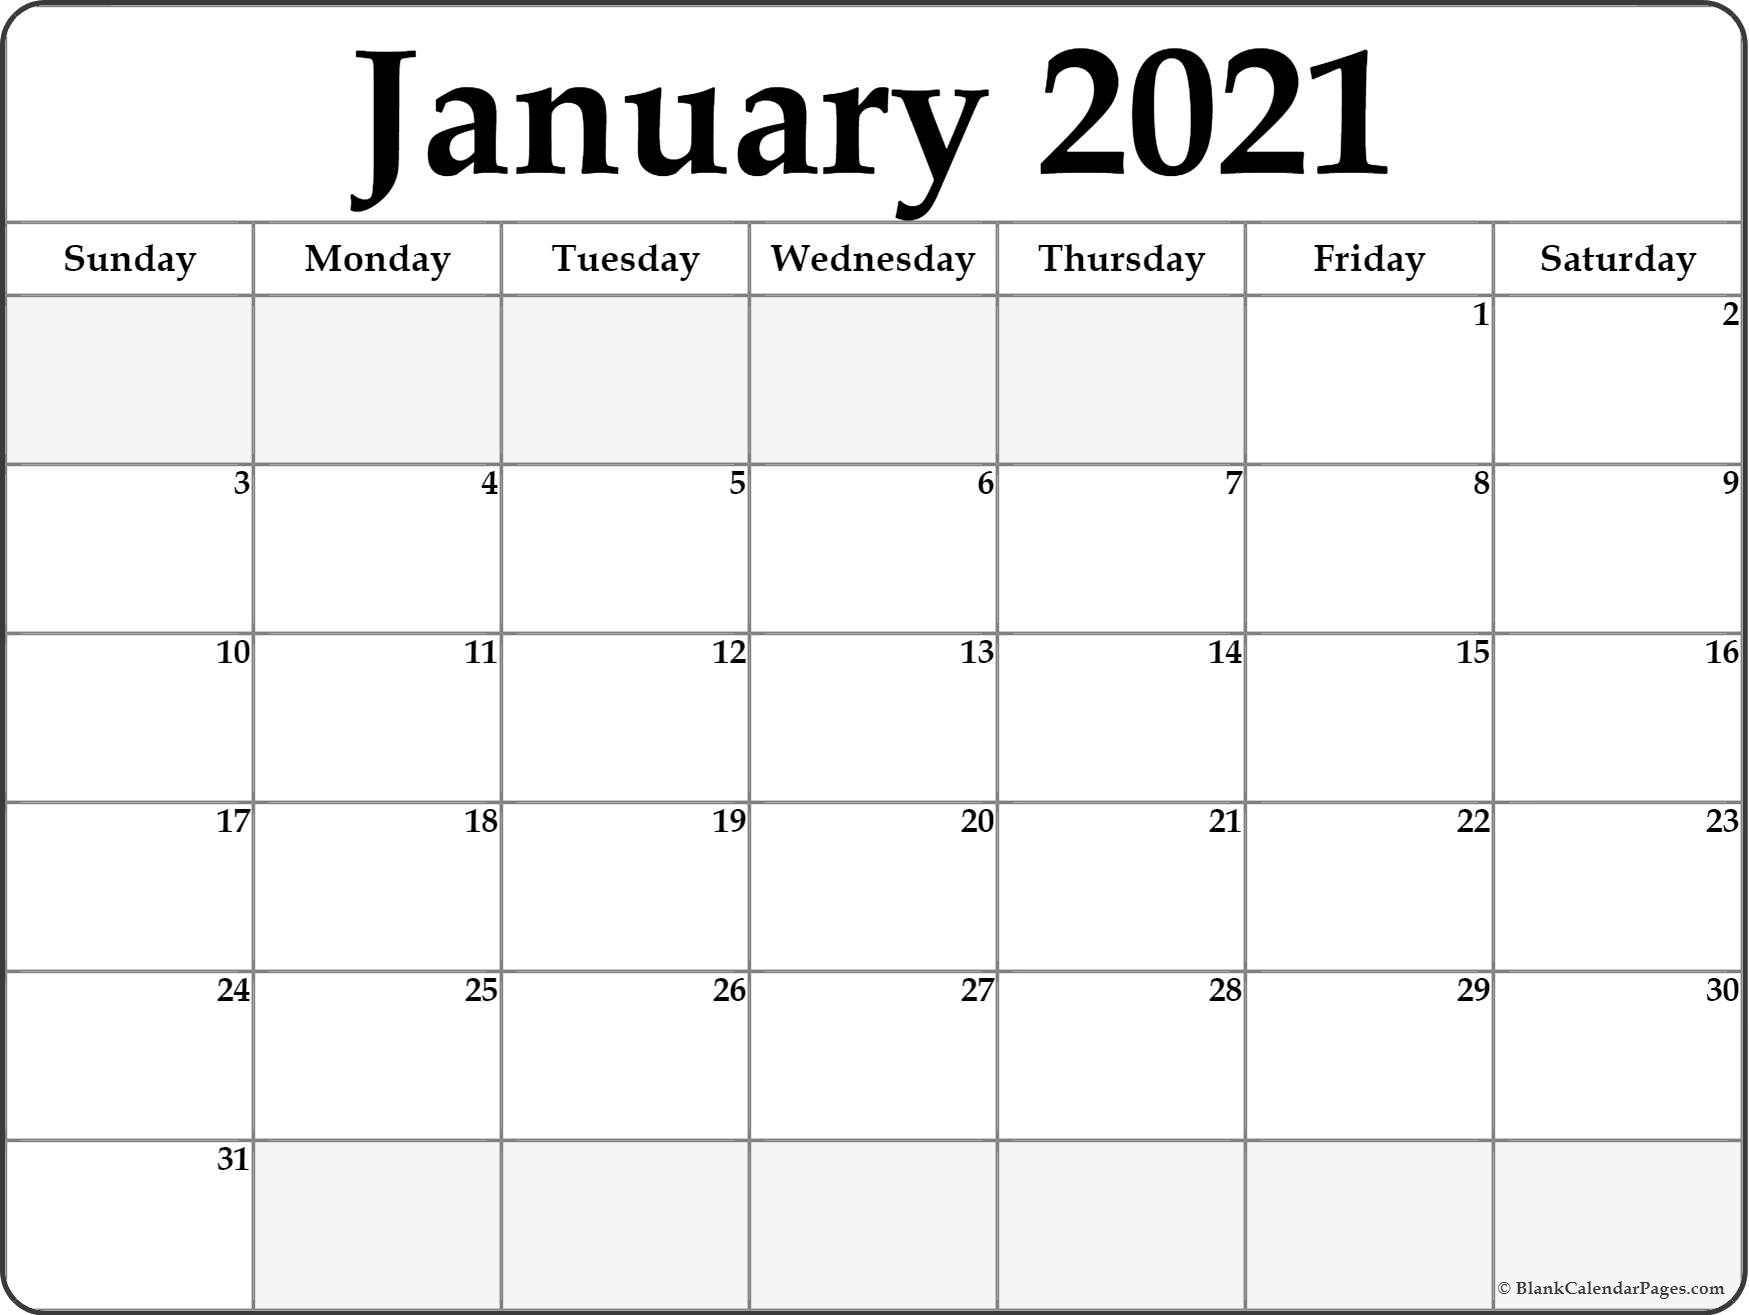 January 2021 Blank Calendar Collection